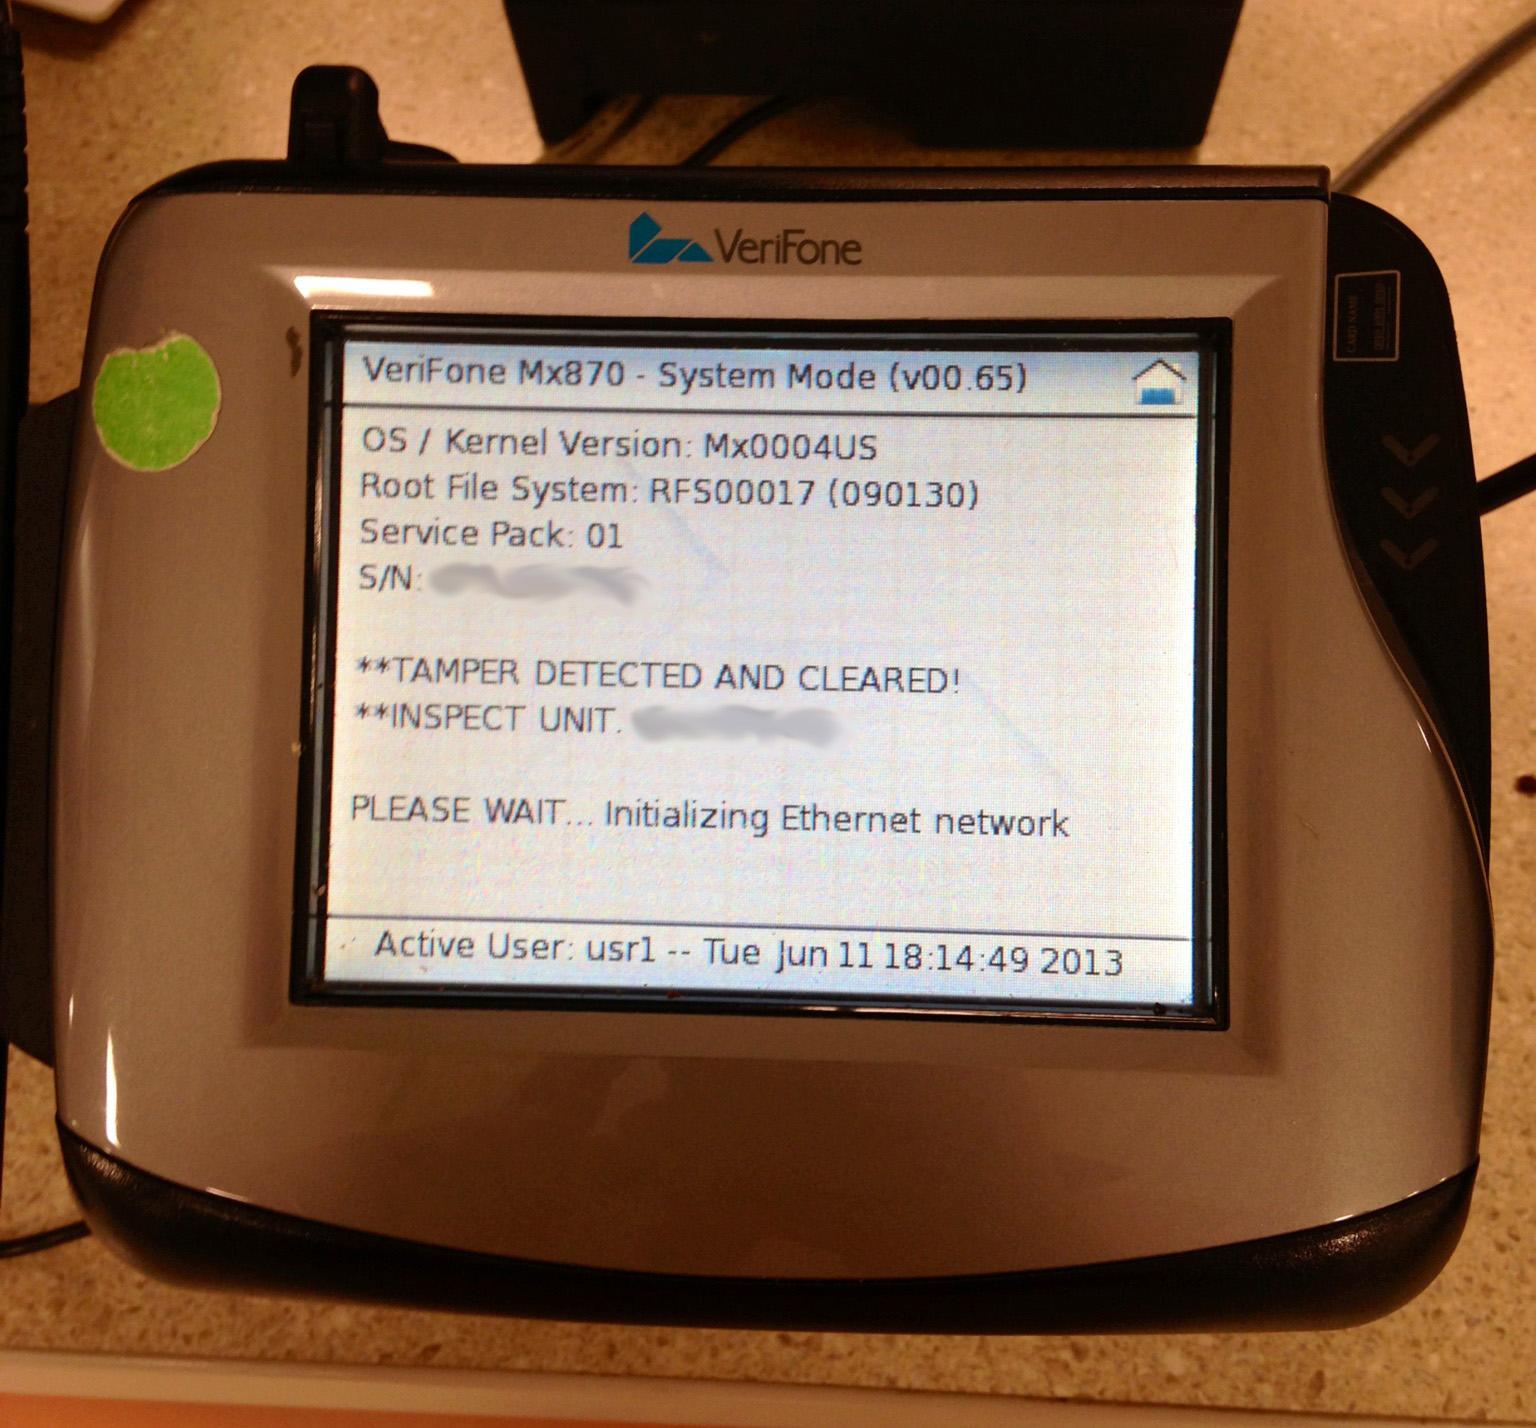 verifone reset Crashpad 1.0: Verifone Mx870